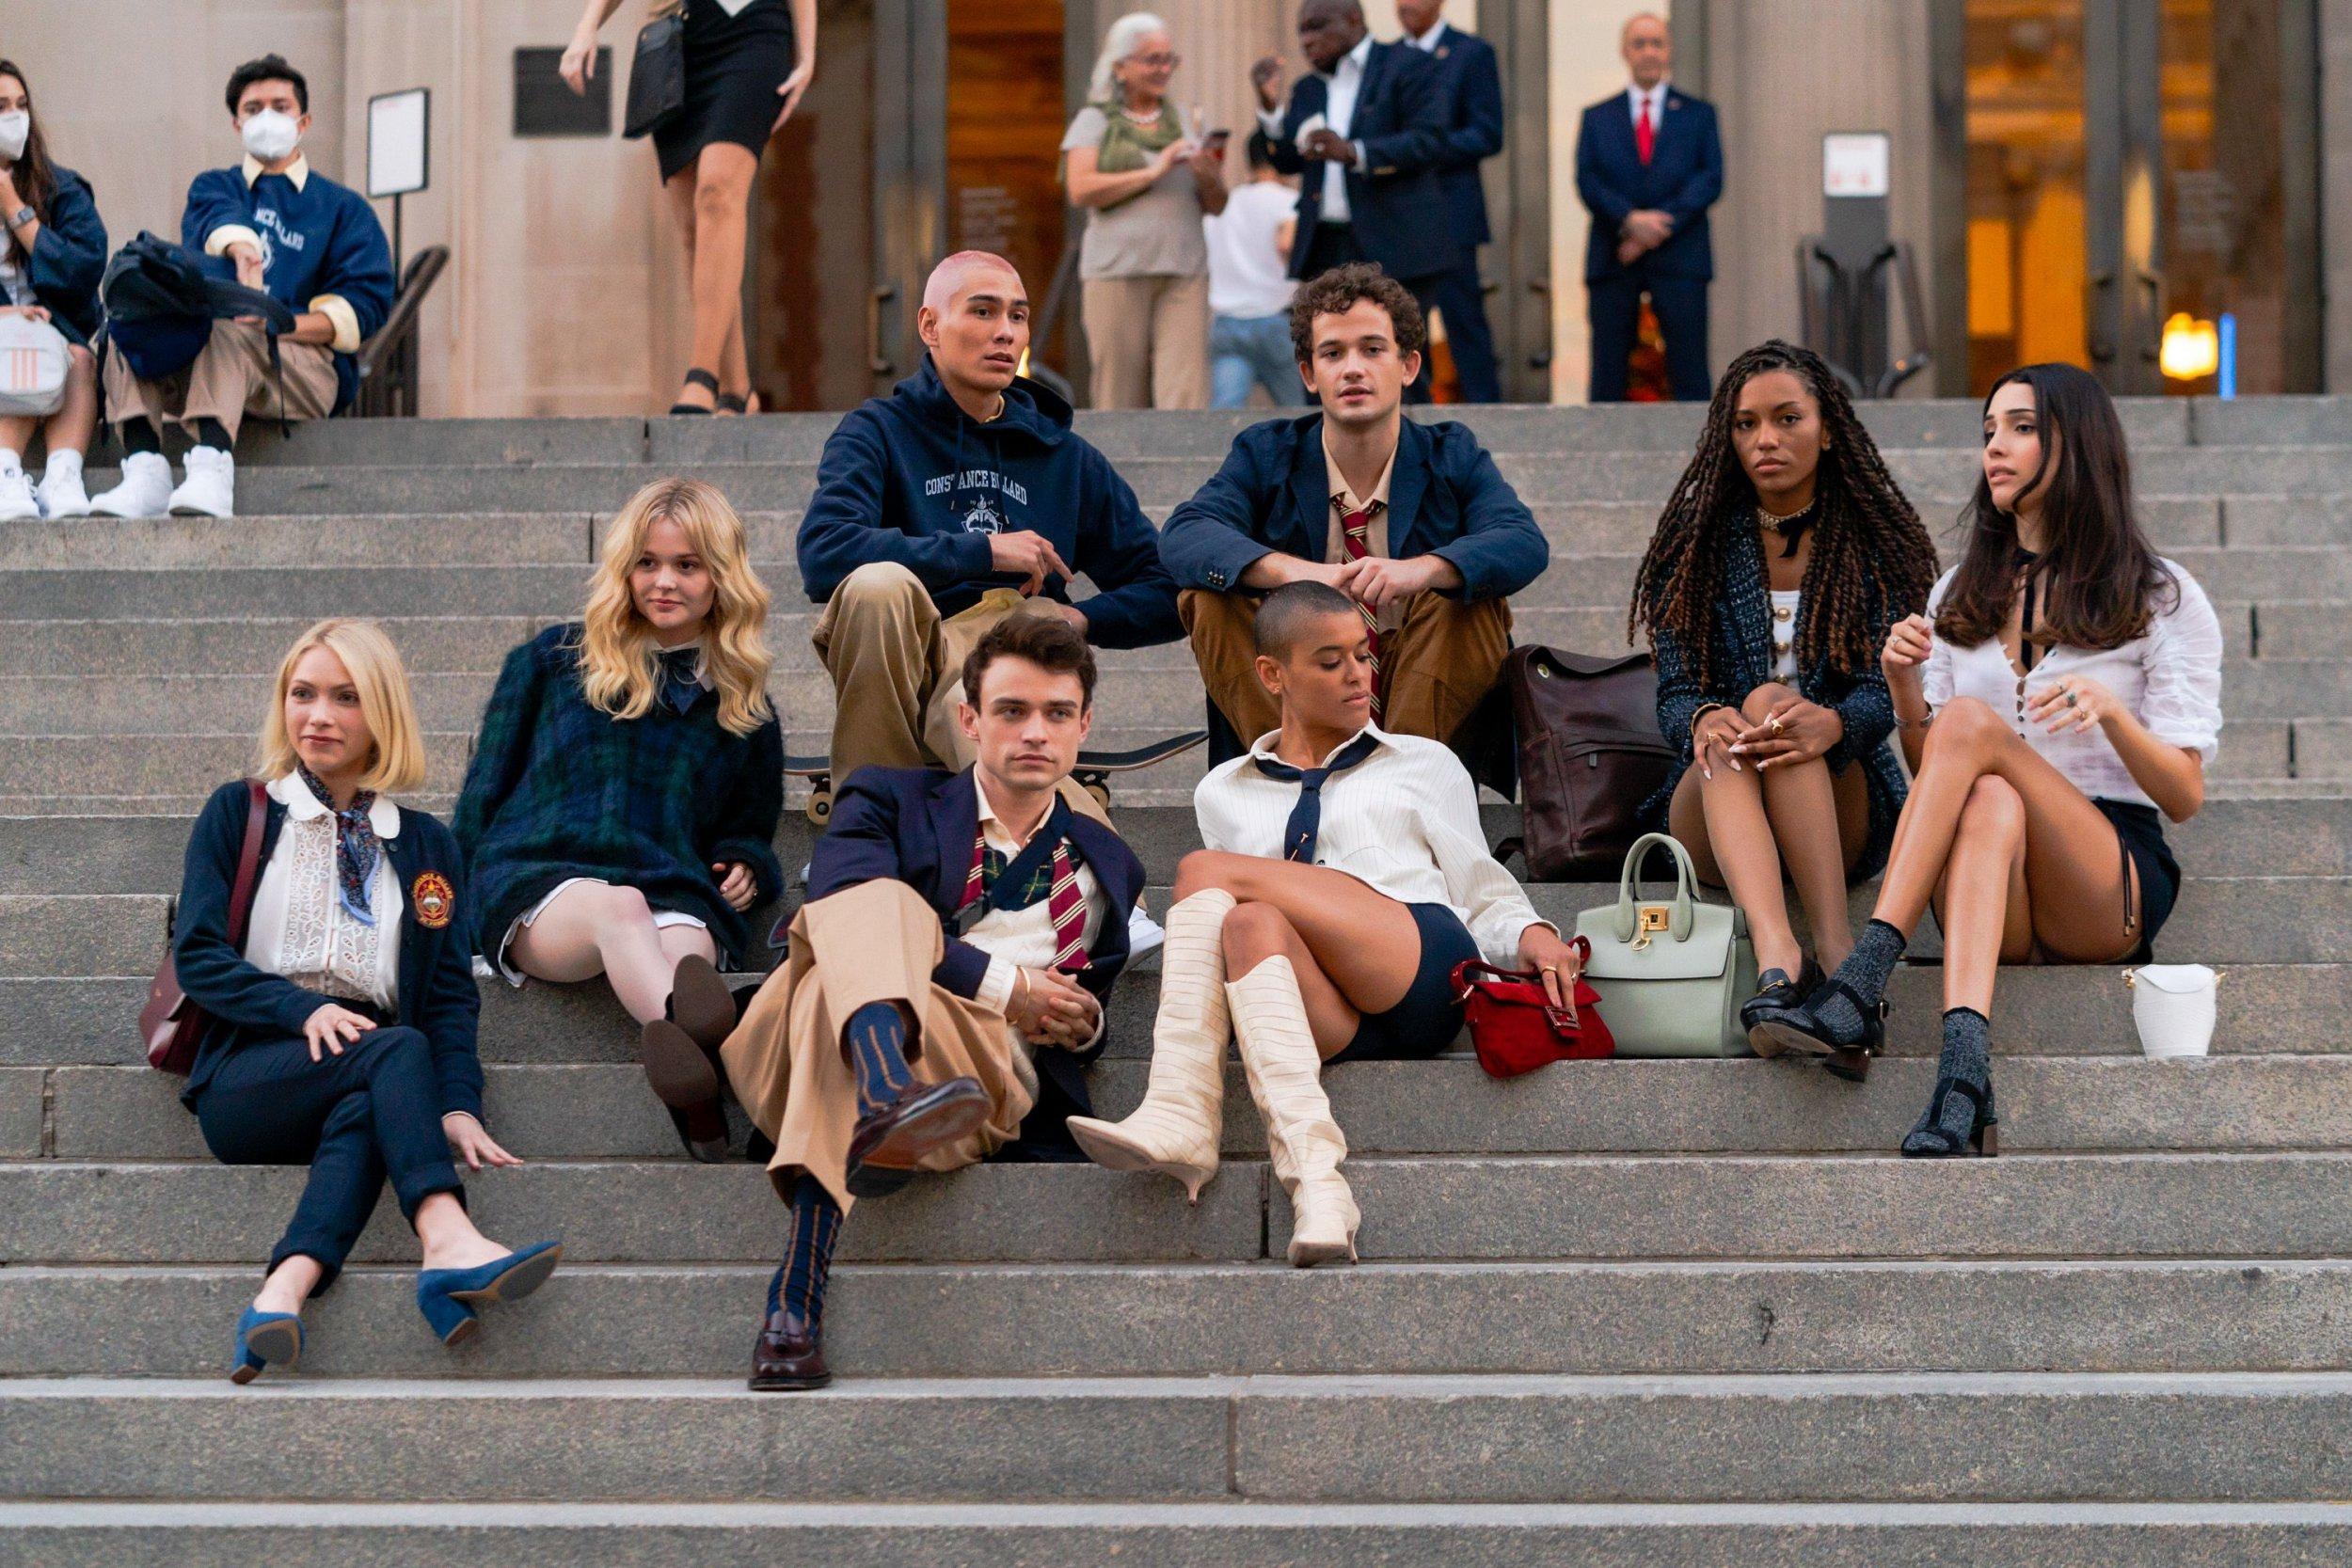 Gossip Girl Reboot Has Different Fashion Than the Original Series